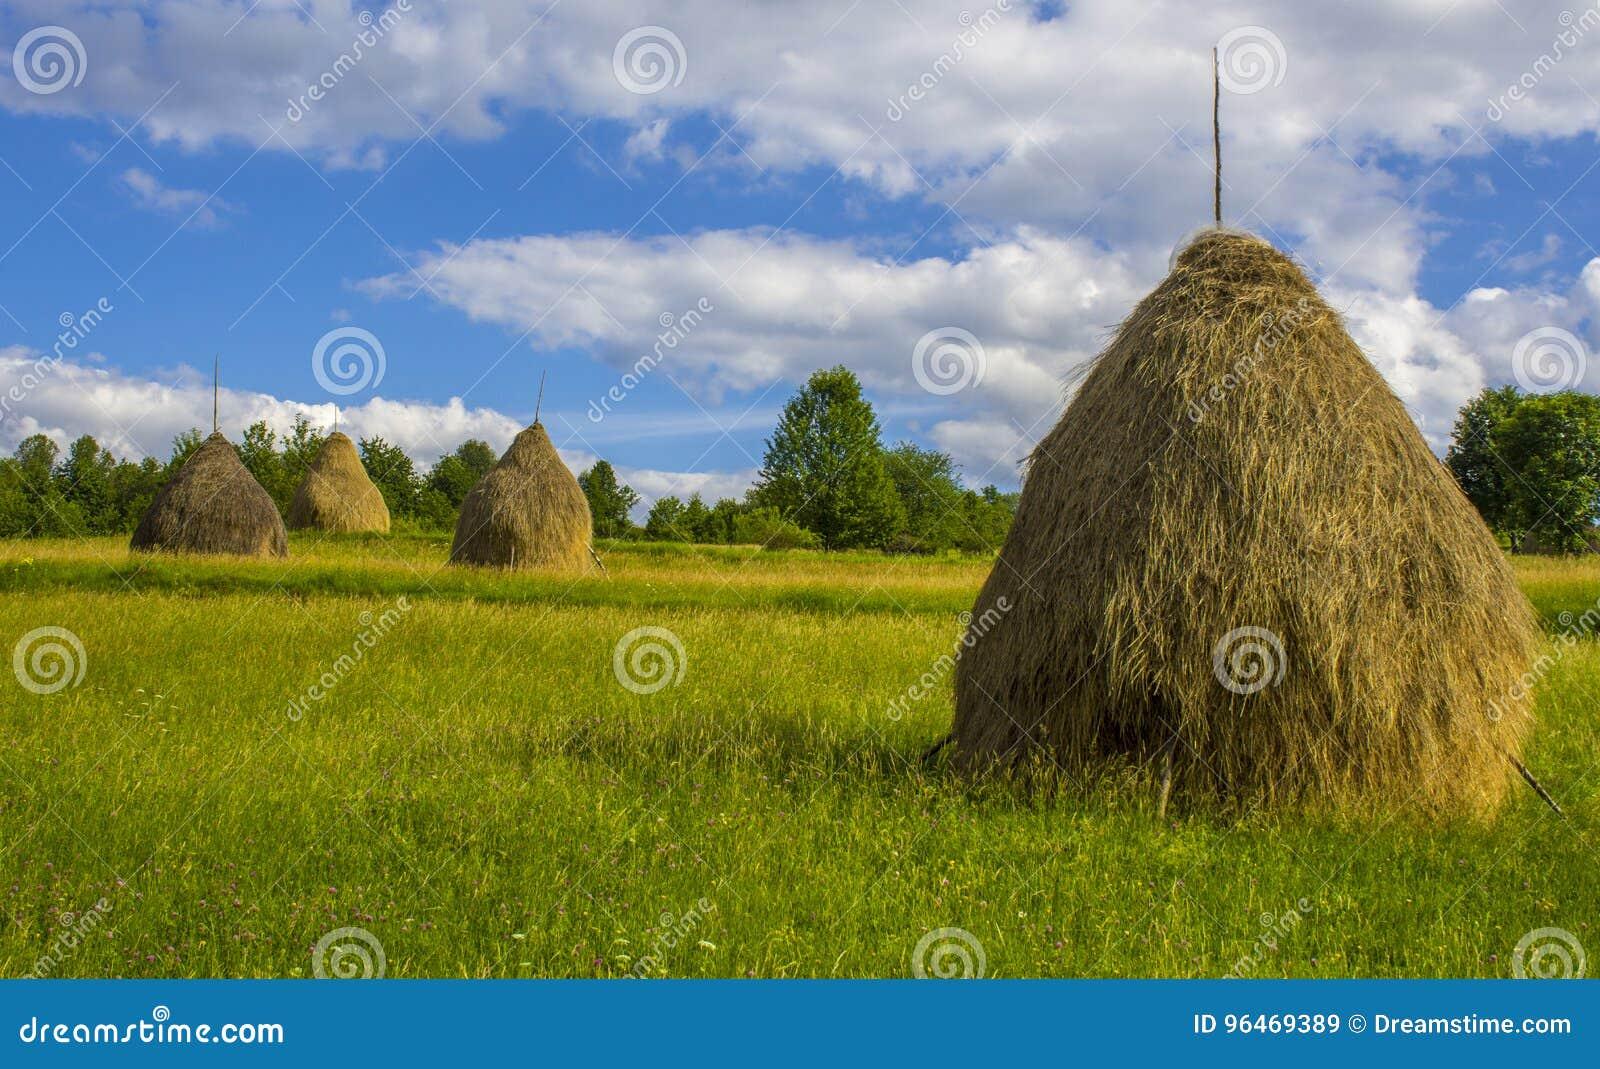 Locale Hay Bales in Breb rurale, Romania